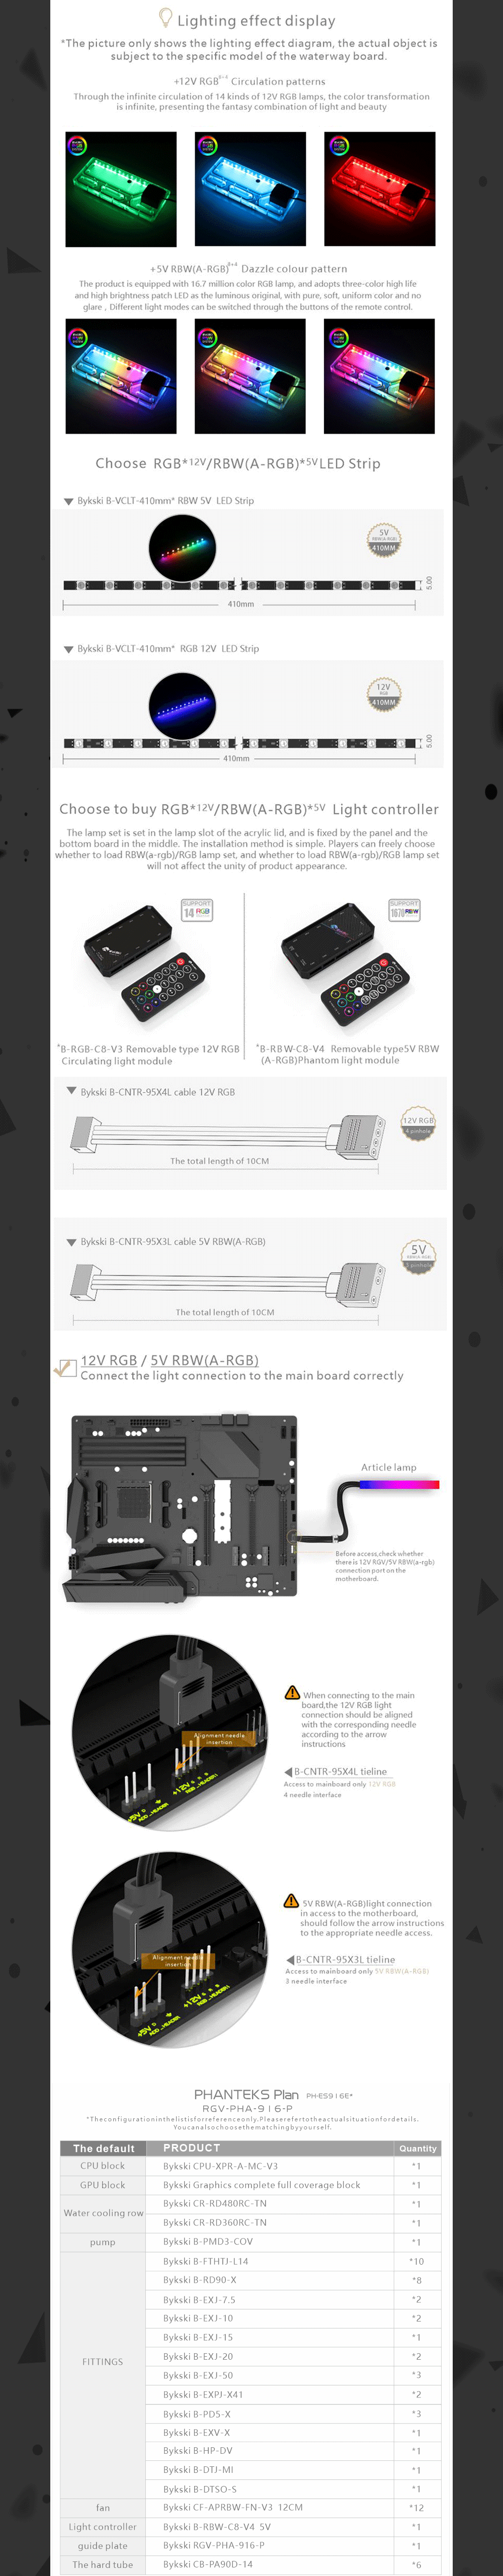 Bykski Waterway Cooling Kit For PHANTEKS PH-ES916E Case, 5V ARGB, For Single GPU Building, RGV-PHA-916-P